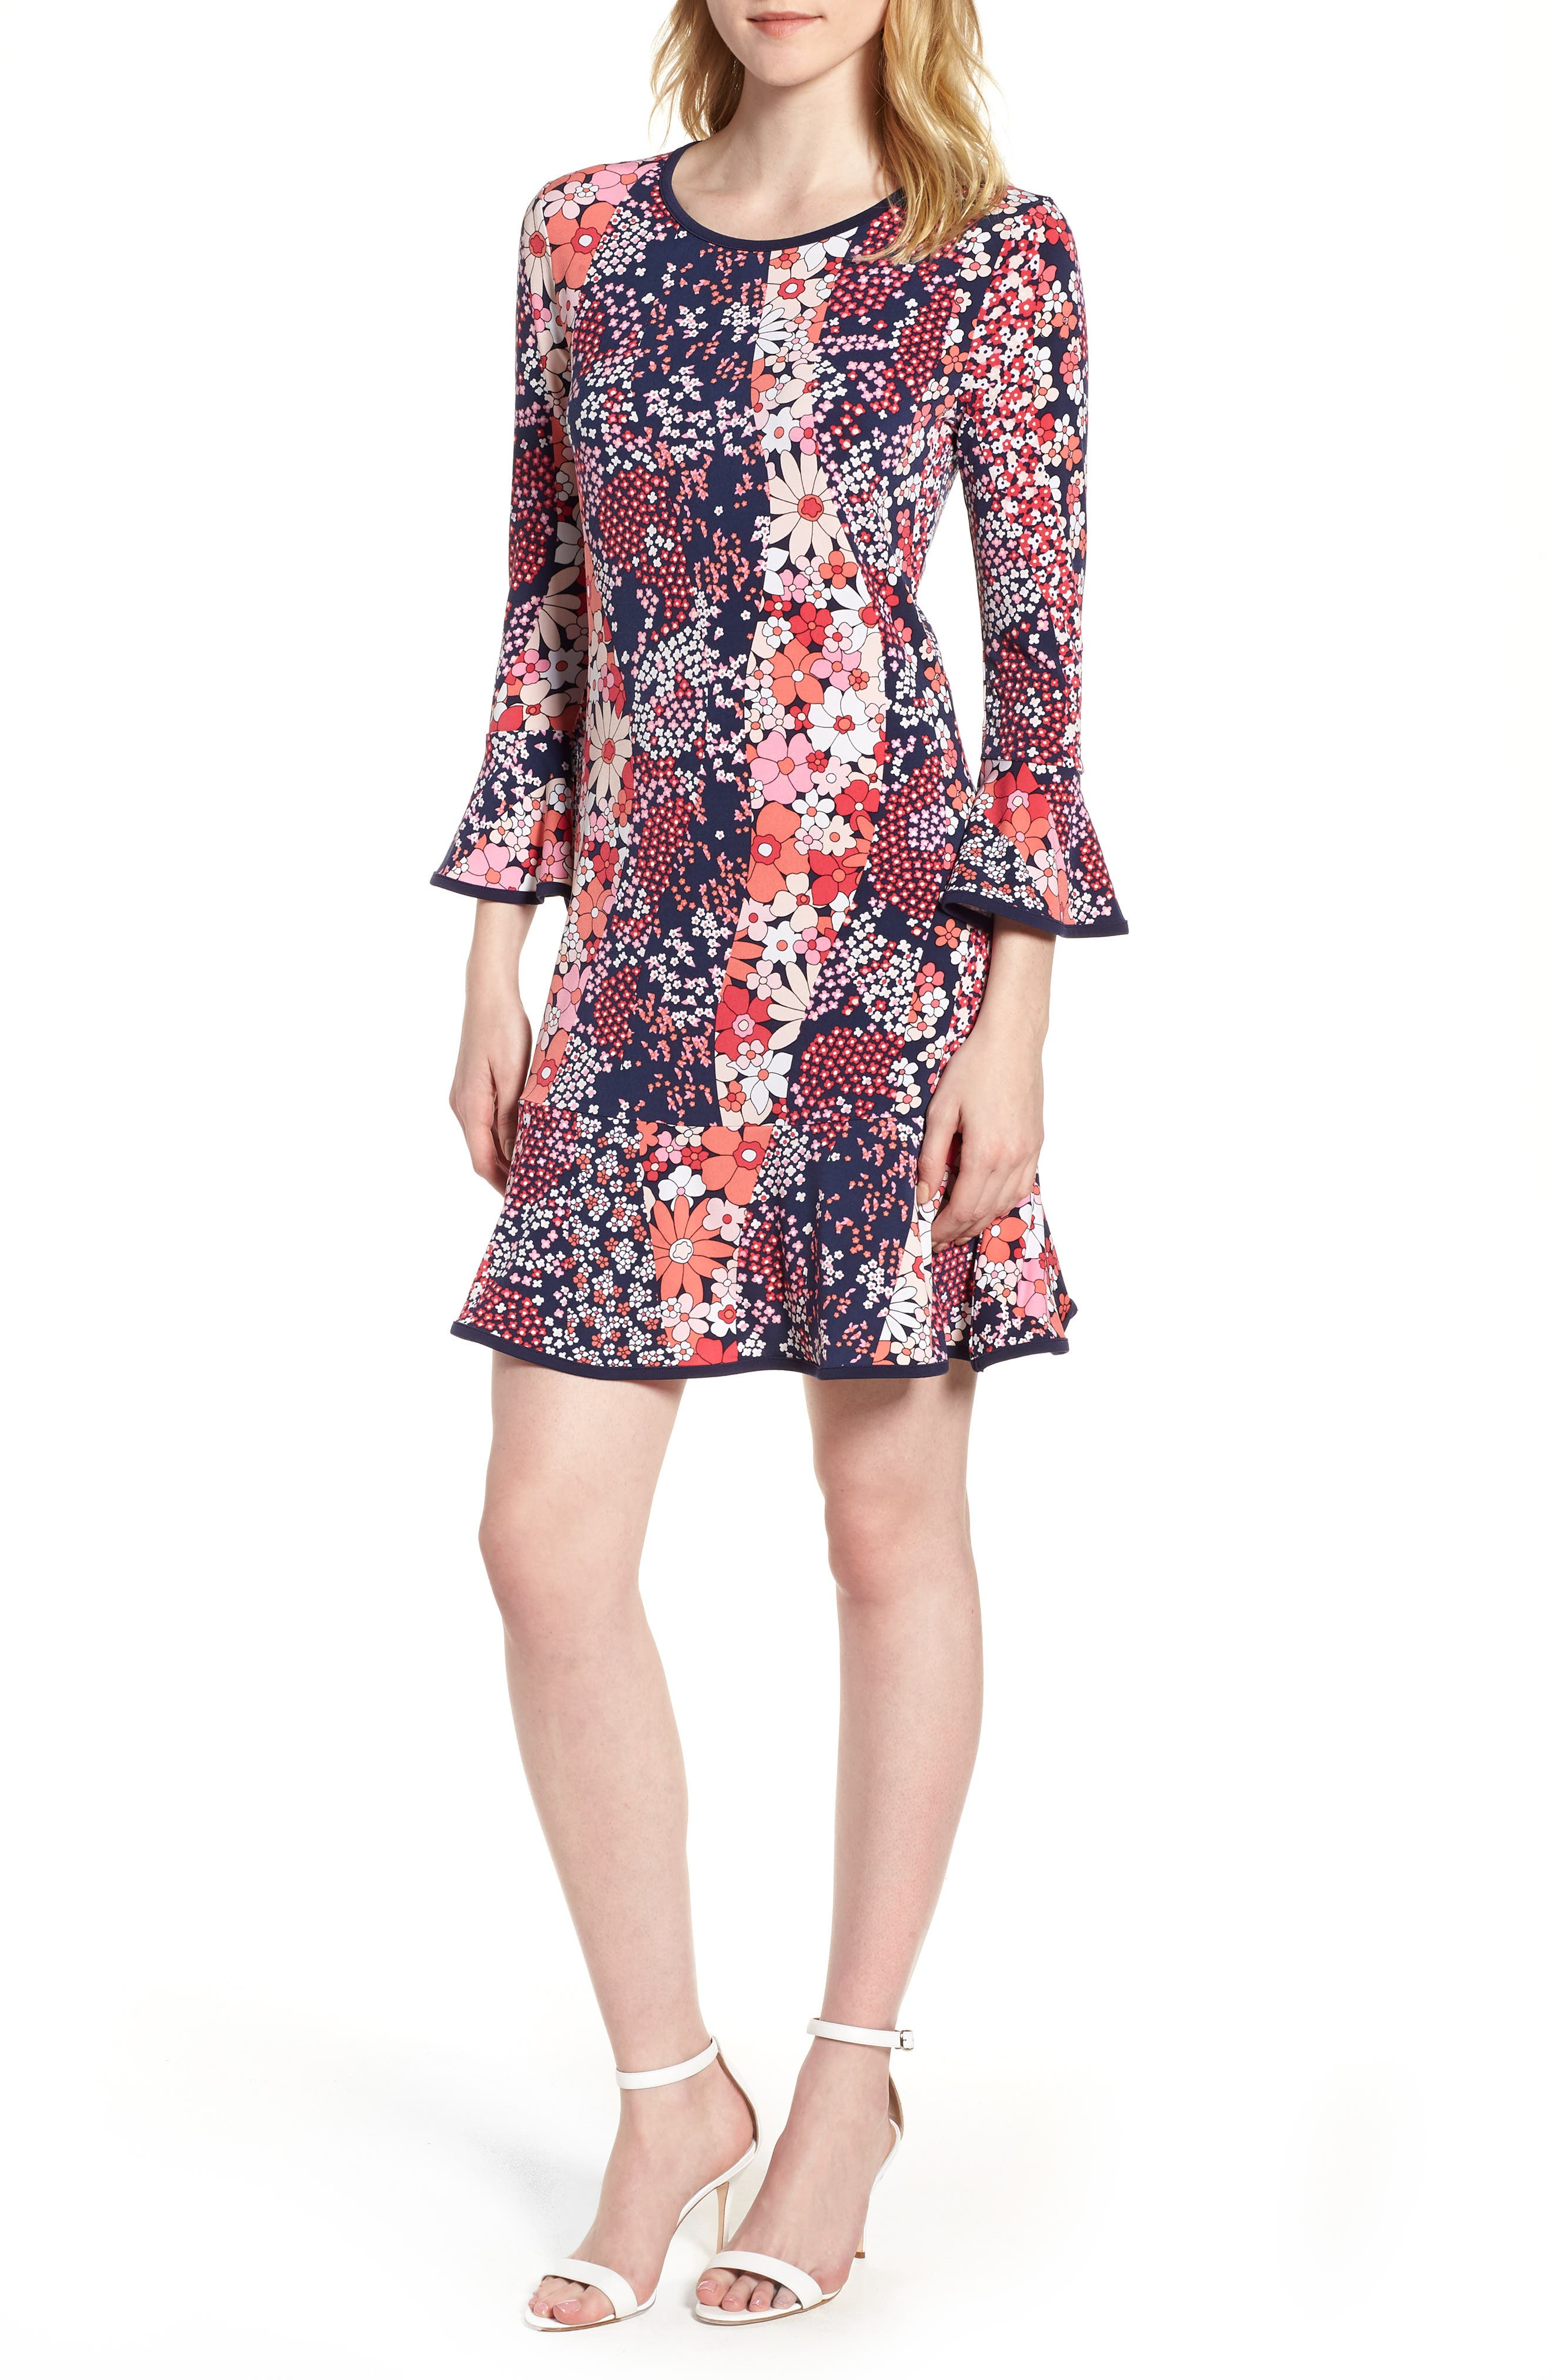 Patch Flower Flounce Dress,                             Main thumbnail 1, color,                             True Navy/ Bright Blush